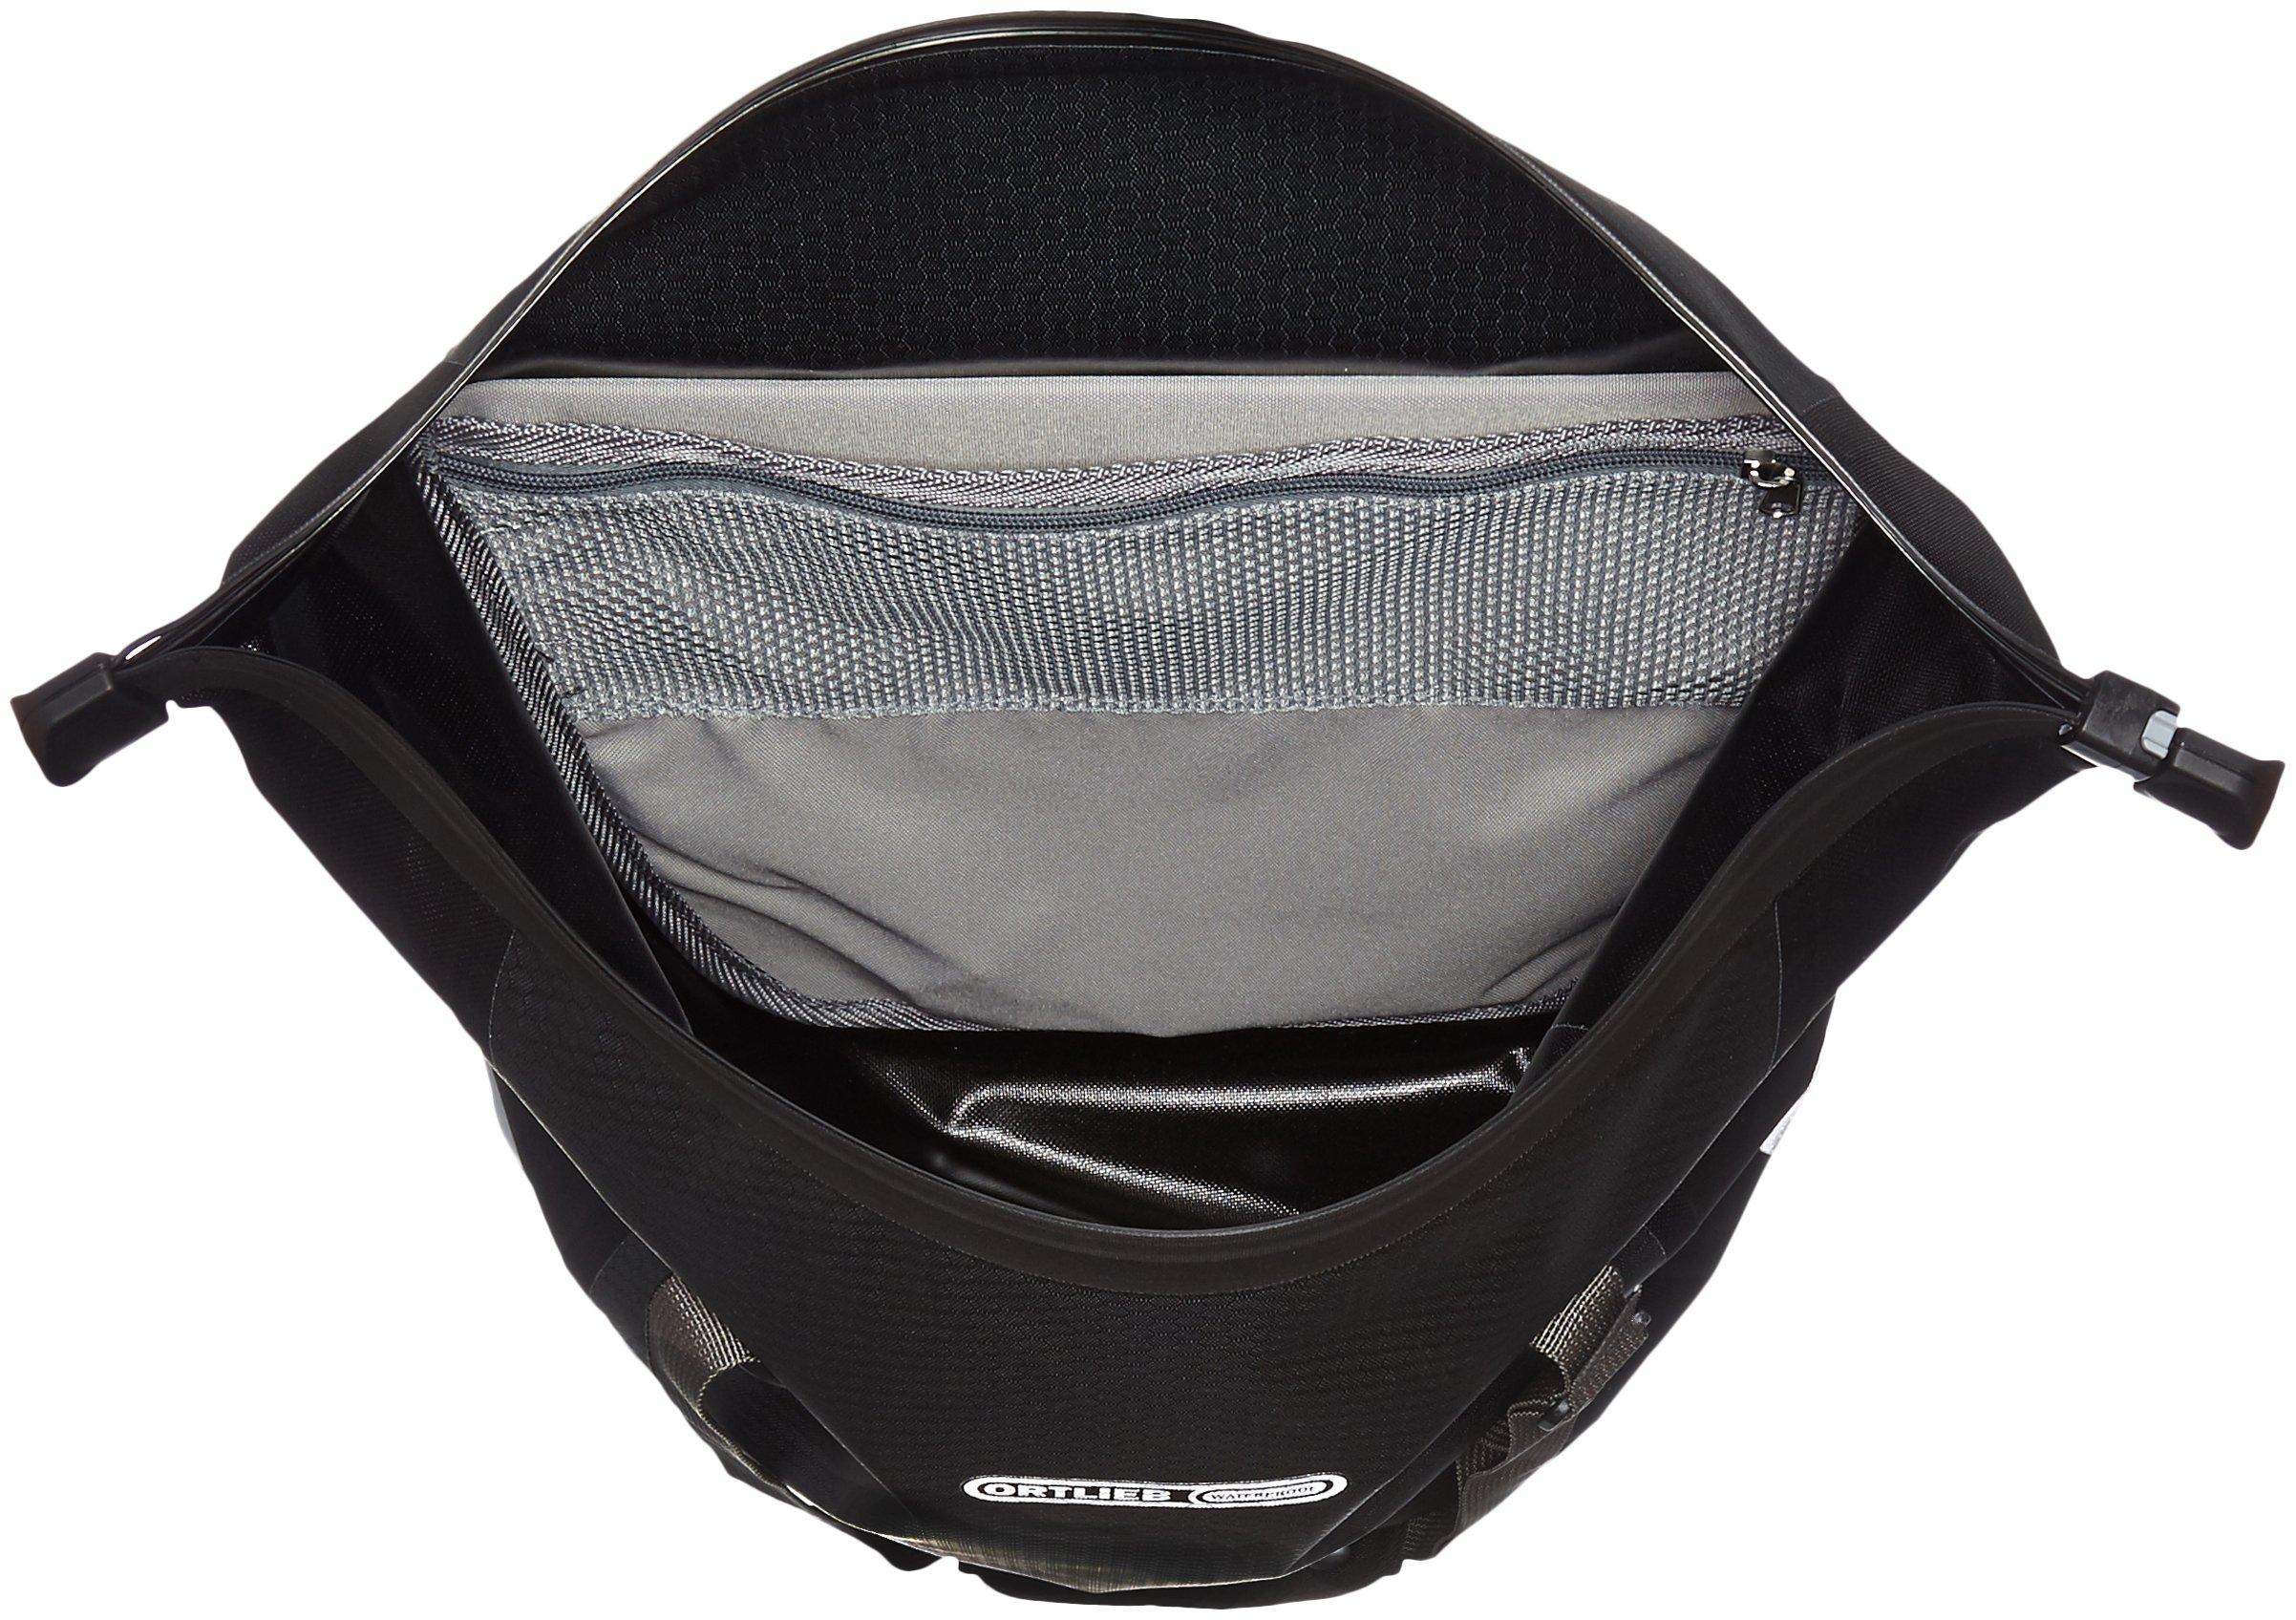 Ortlieb Bike Shopper Pannier: Each, QL2 Hardware, Slate/Black by Ortlieb (Image #5)